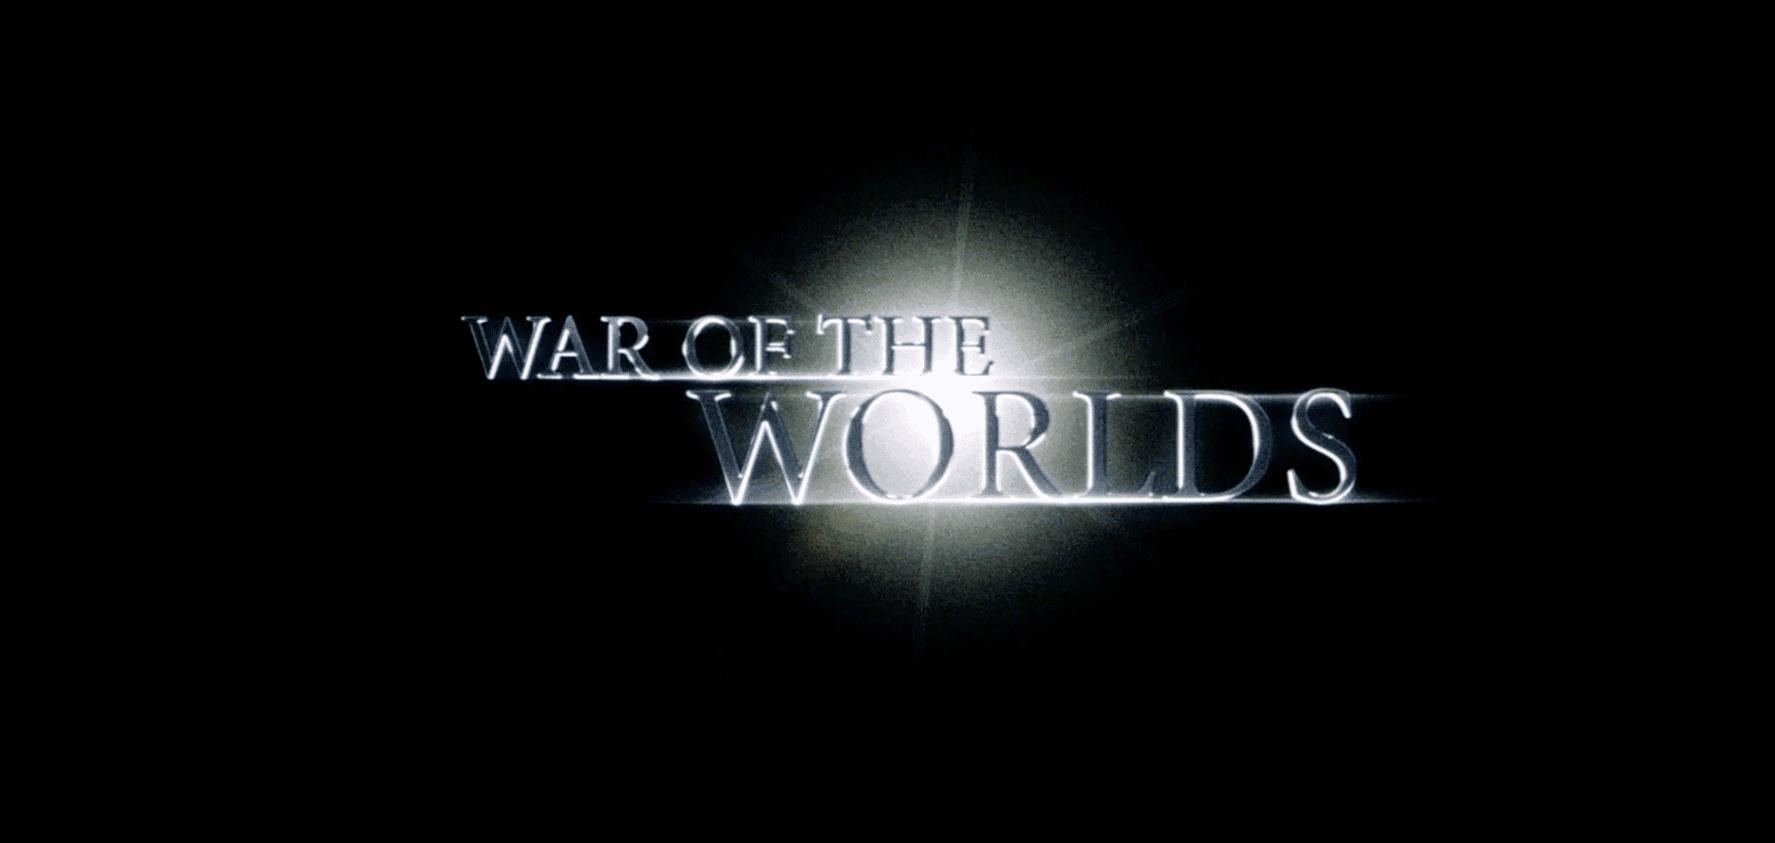 war of the worlds 2004 4k uhd